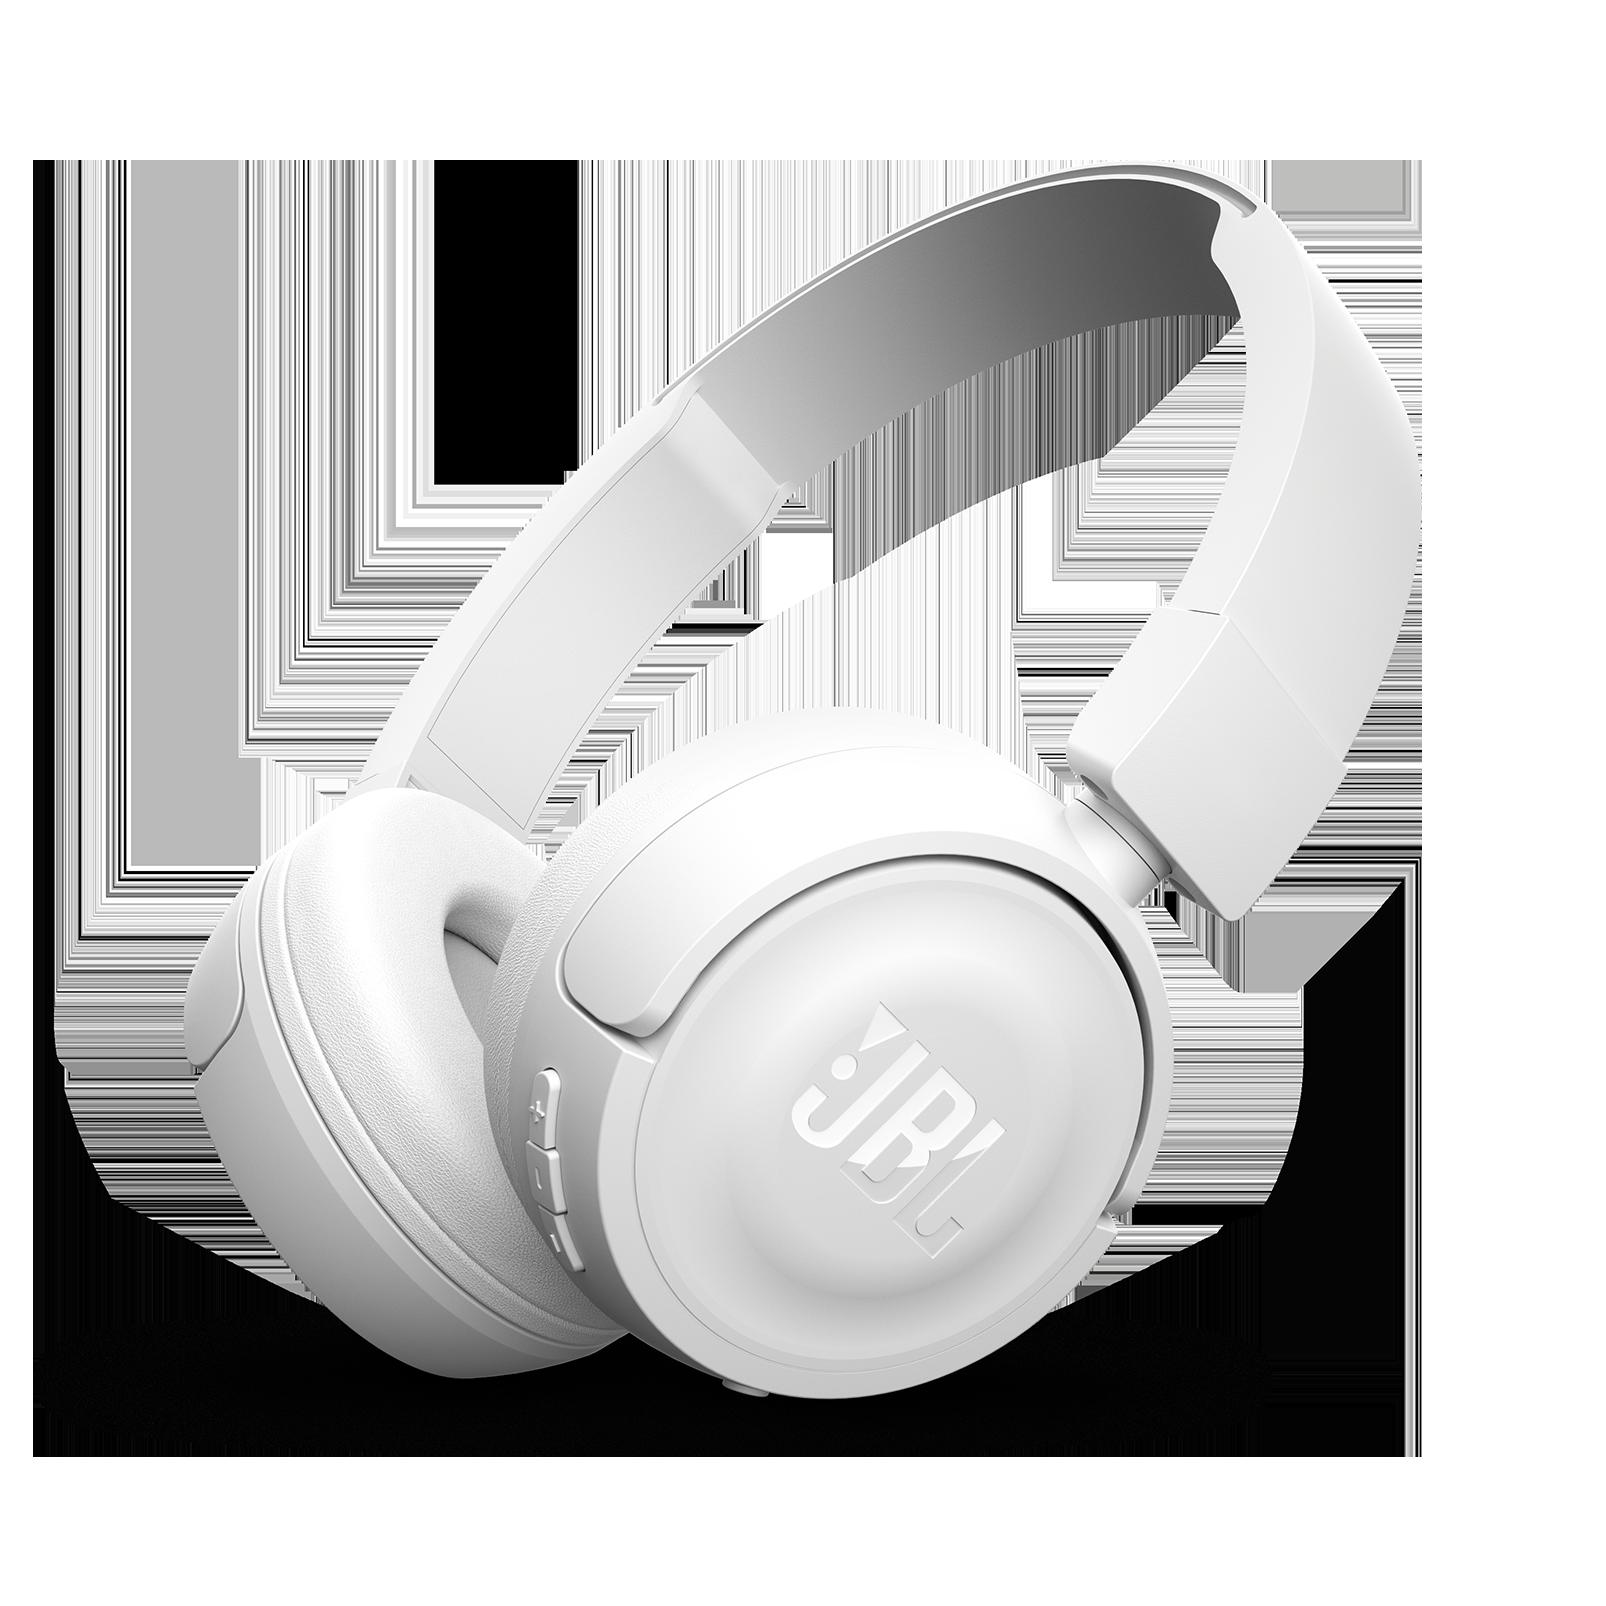 JBL T450BT - White - Wireless on-ear headphones - Hero